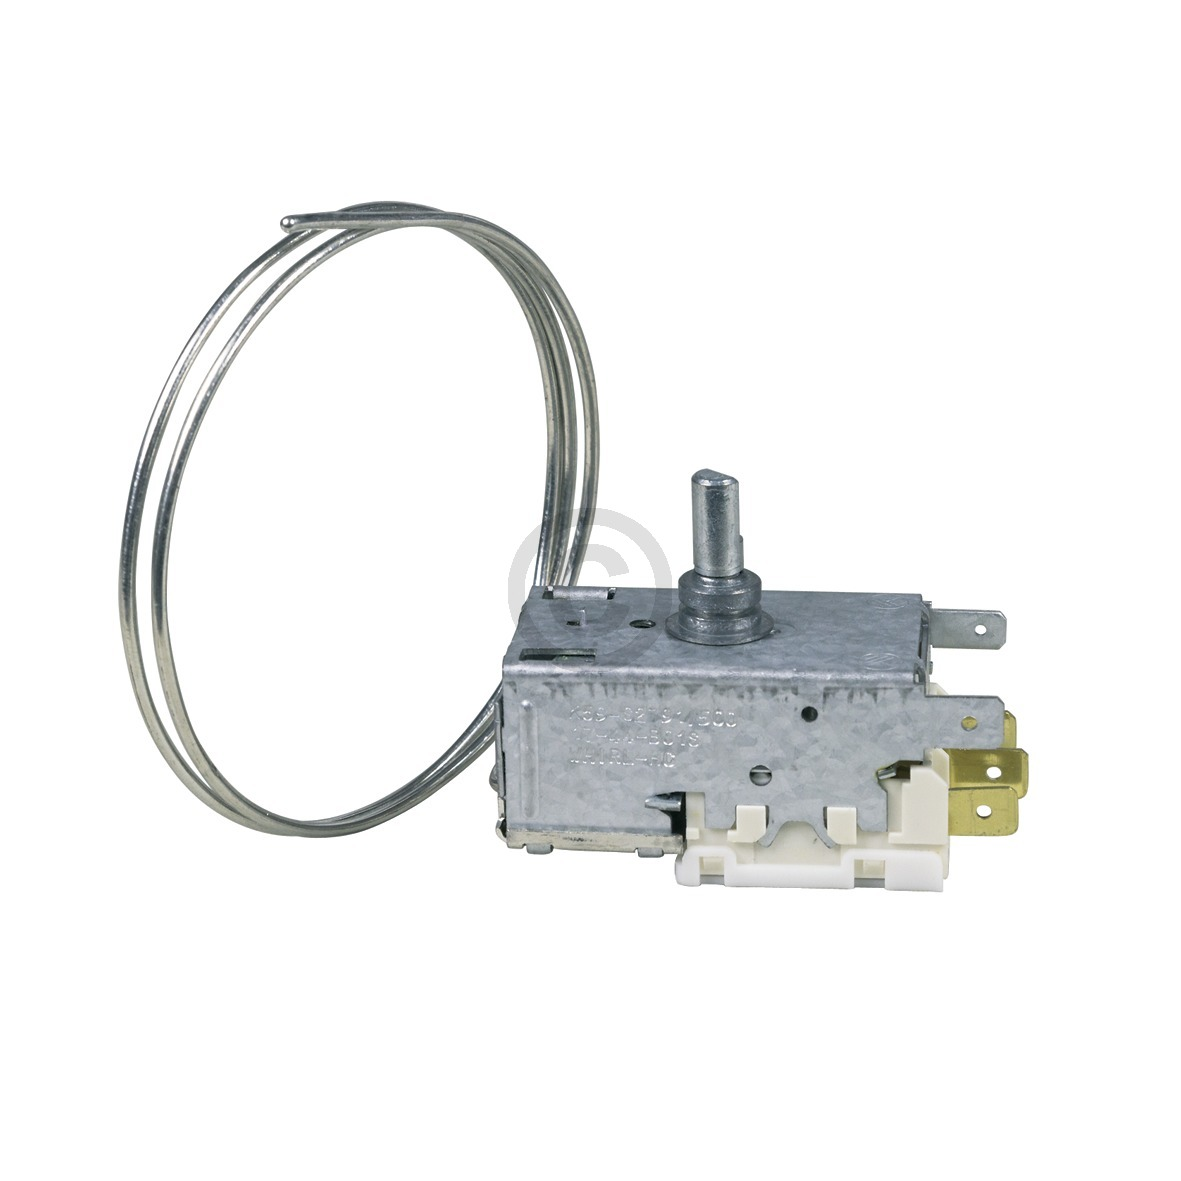 Thermostat Whirlpool 481228238188 Ranco K59-S2791/500 für Kühlschrank